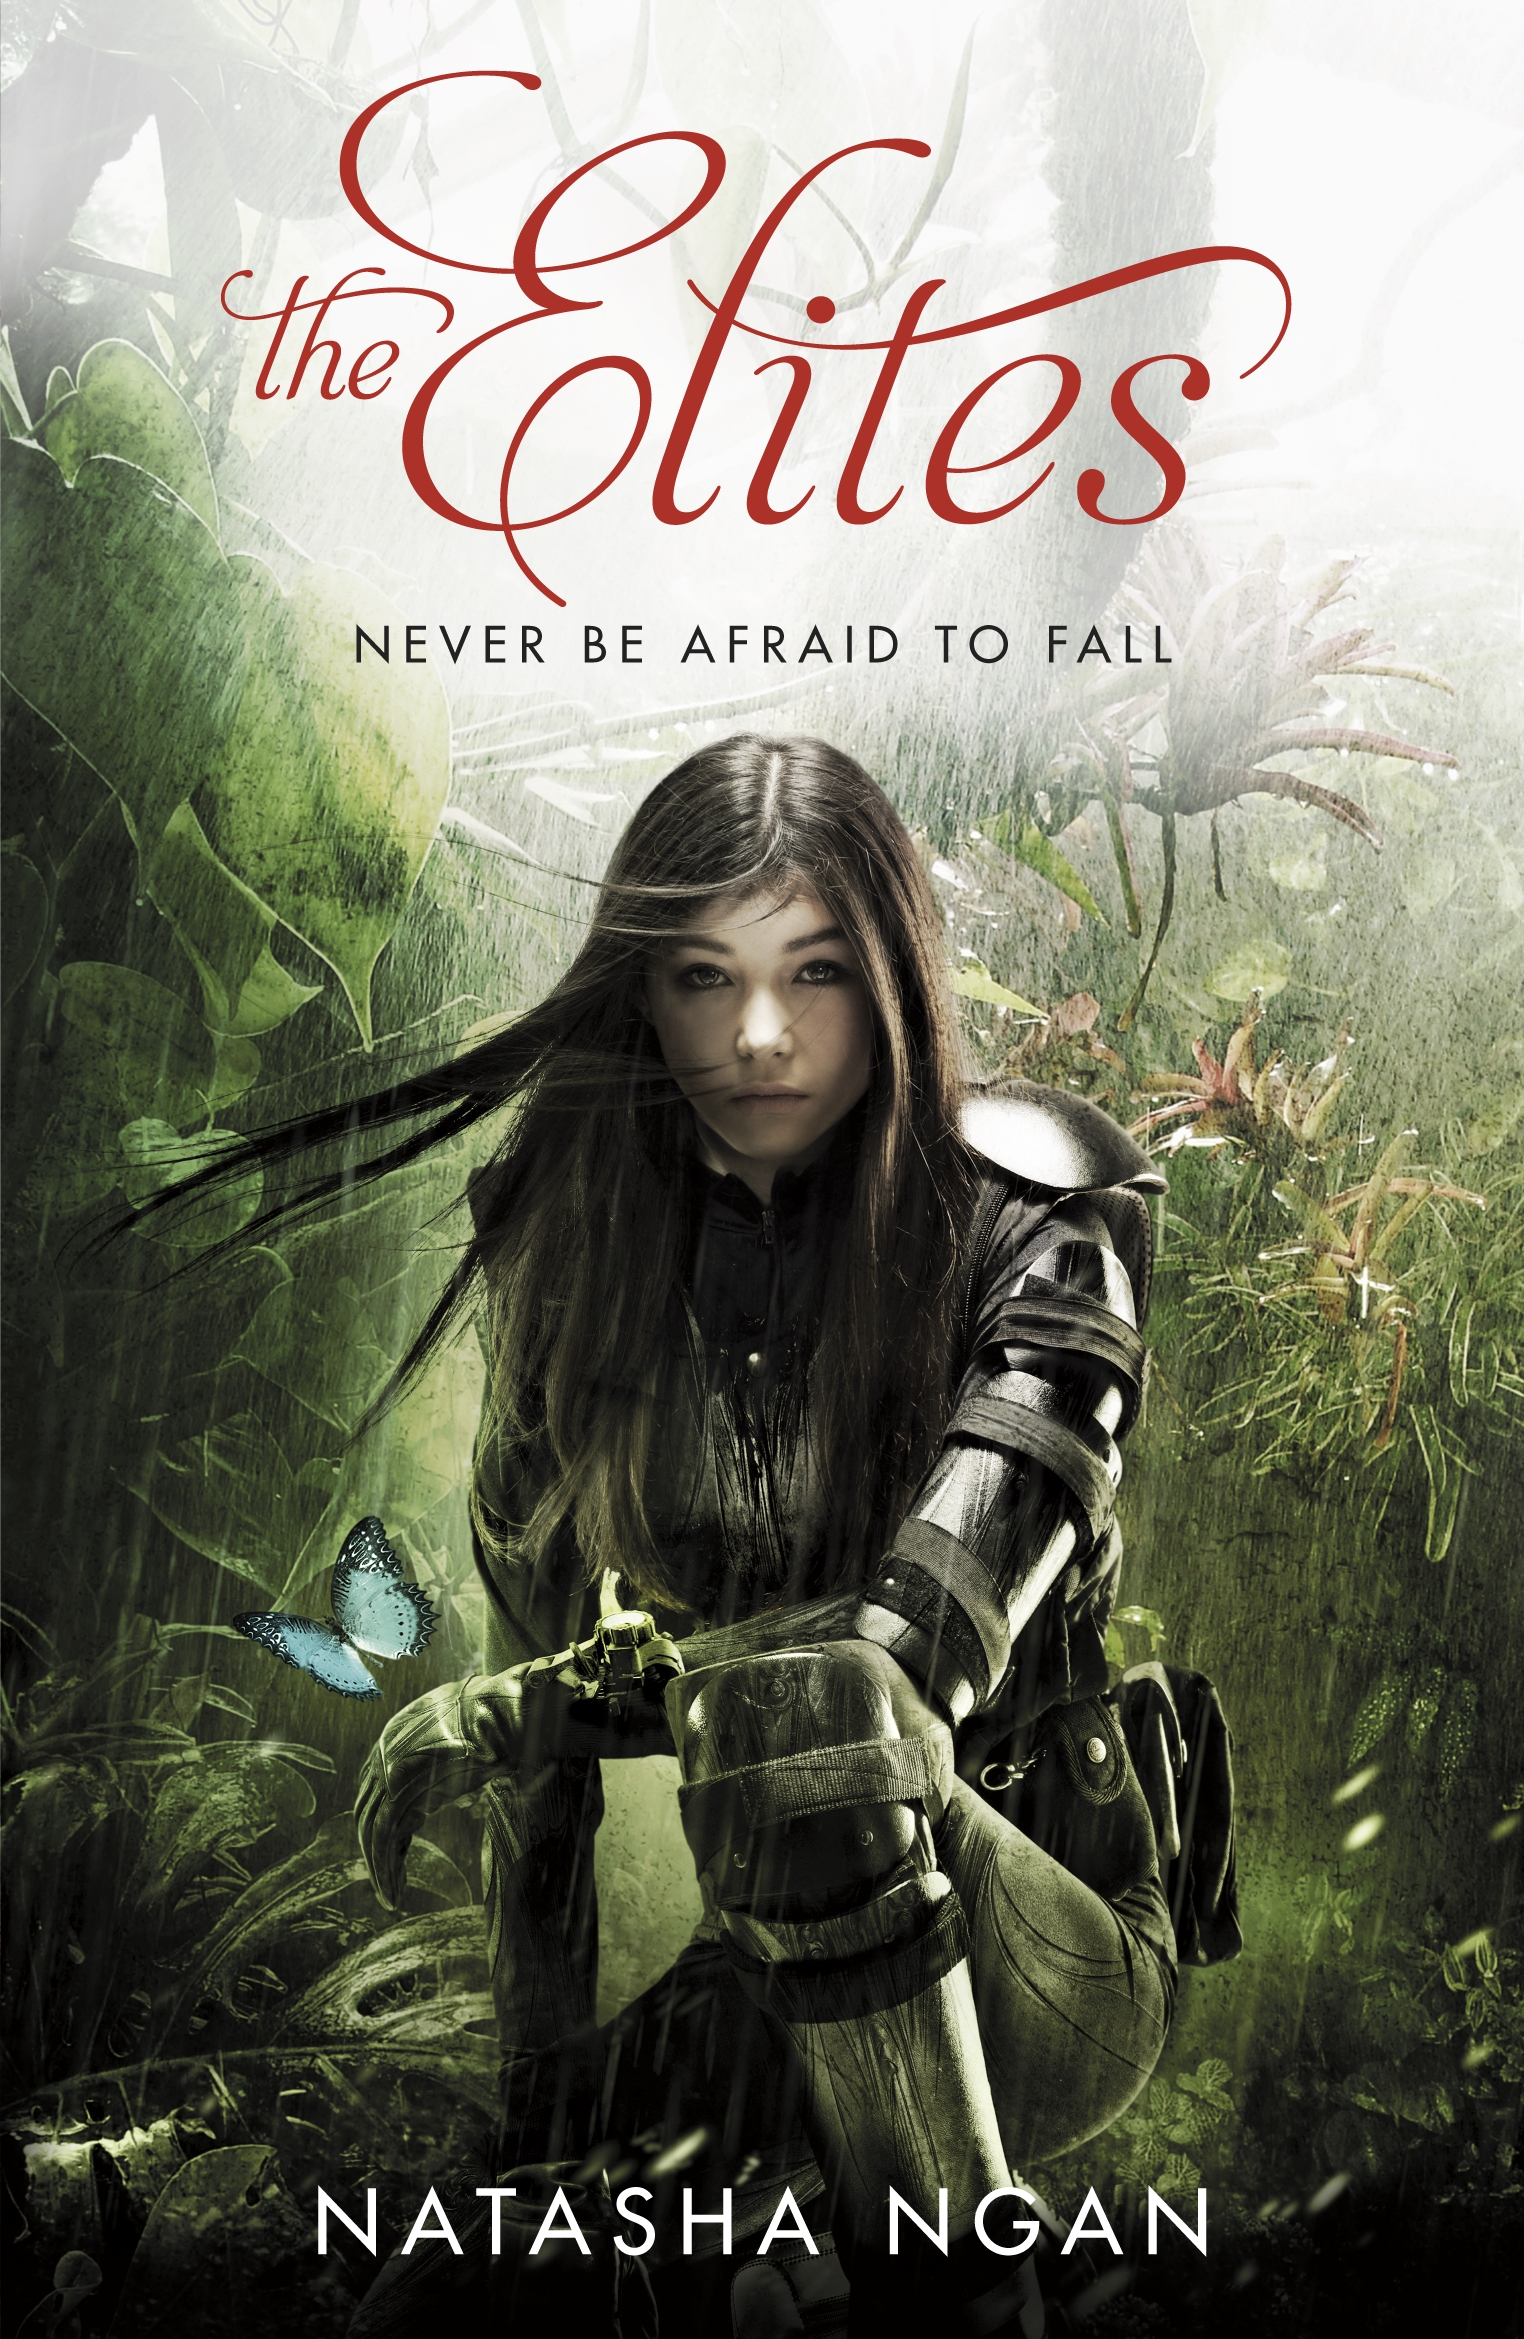 The Elites by Natasha Ngan